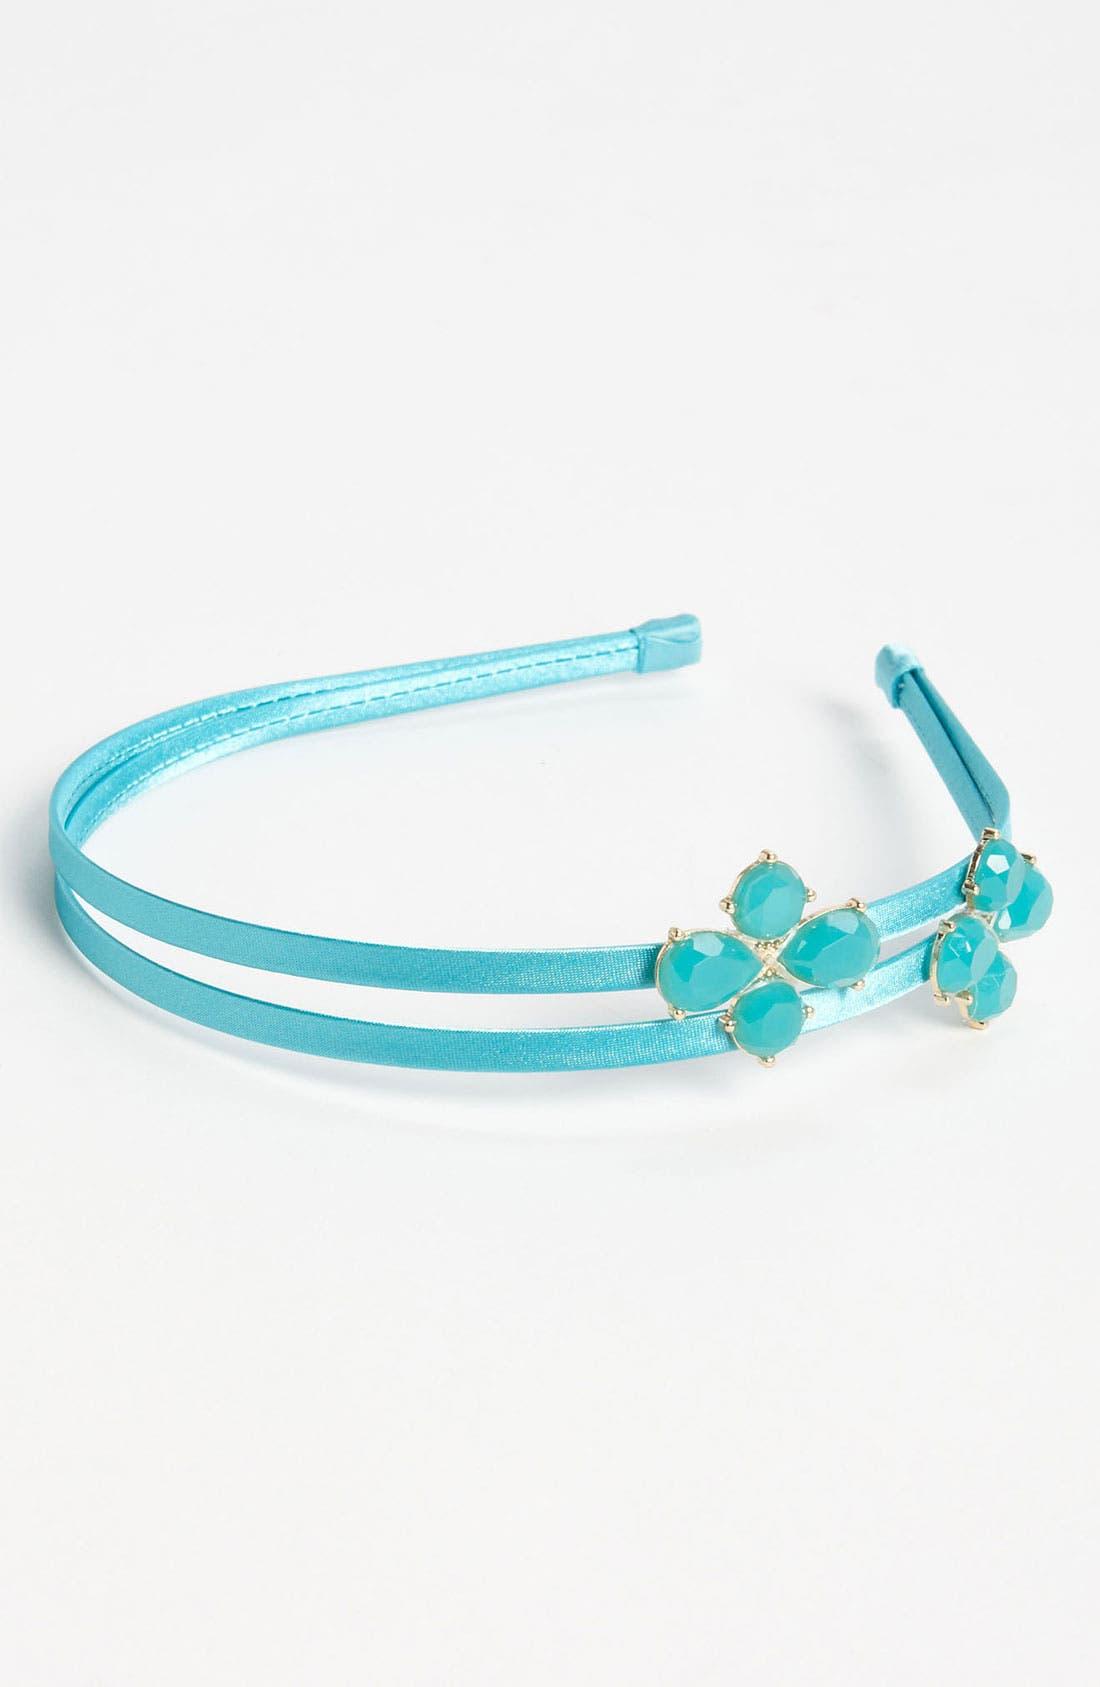 Main Image - Tasha 'Double My Luck' Headband